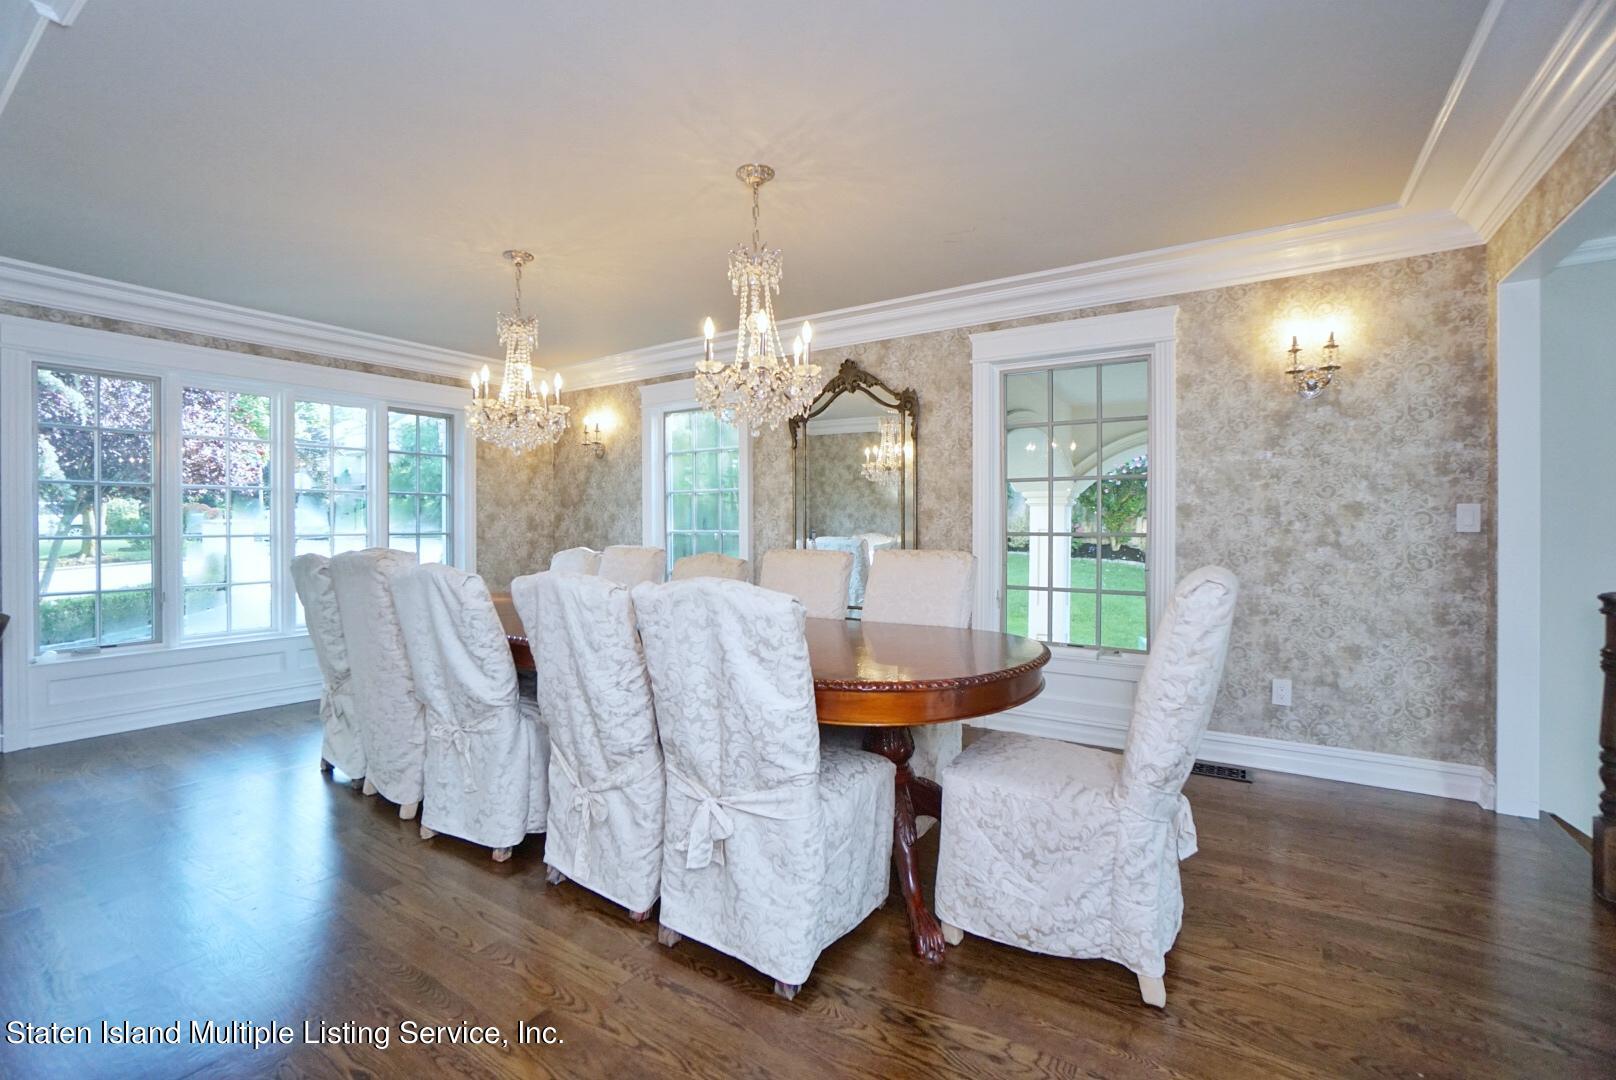 Single Family - Detached 116 Fine Blvd   Staten Island, NY 10314, MLS-1148291-12